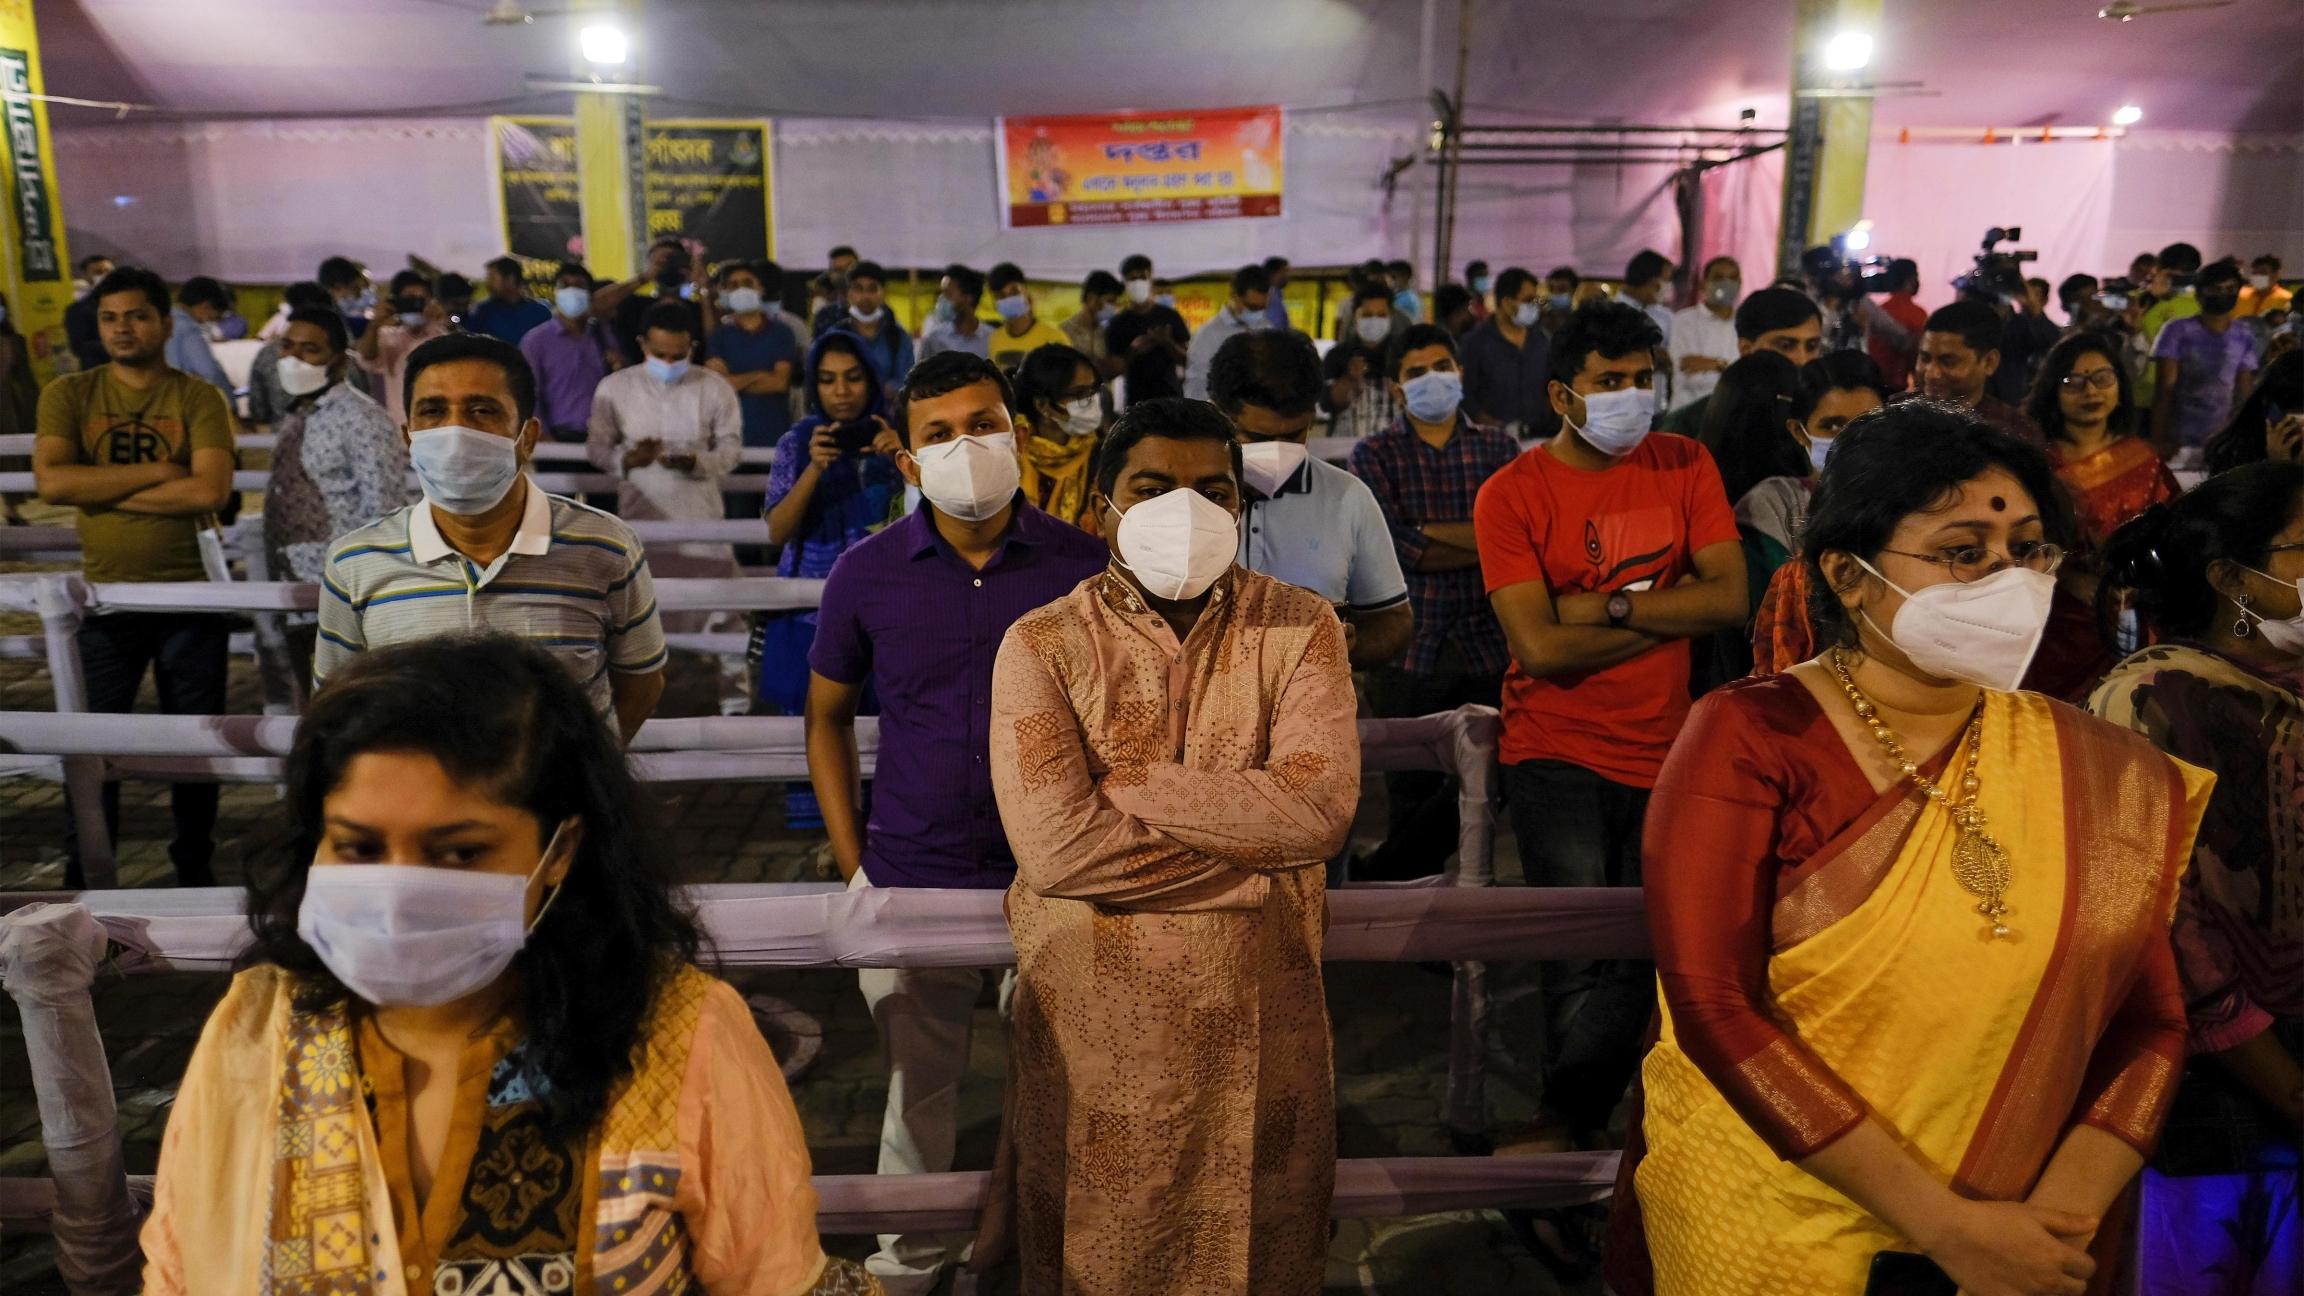 People wearing masks as a precautionary measure against the coronavirus assemble to offer prayers at Dhakeshwari Temple during a Hindu Durga Puja festival in Dhaka, Bangladesh